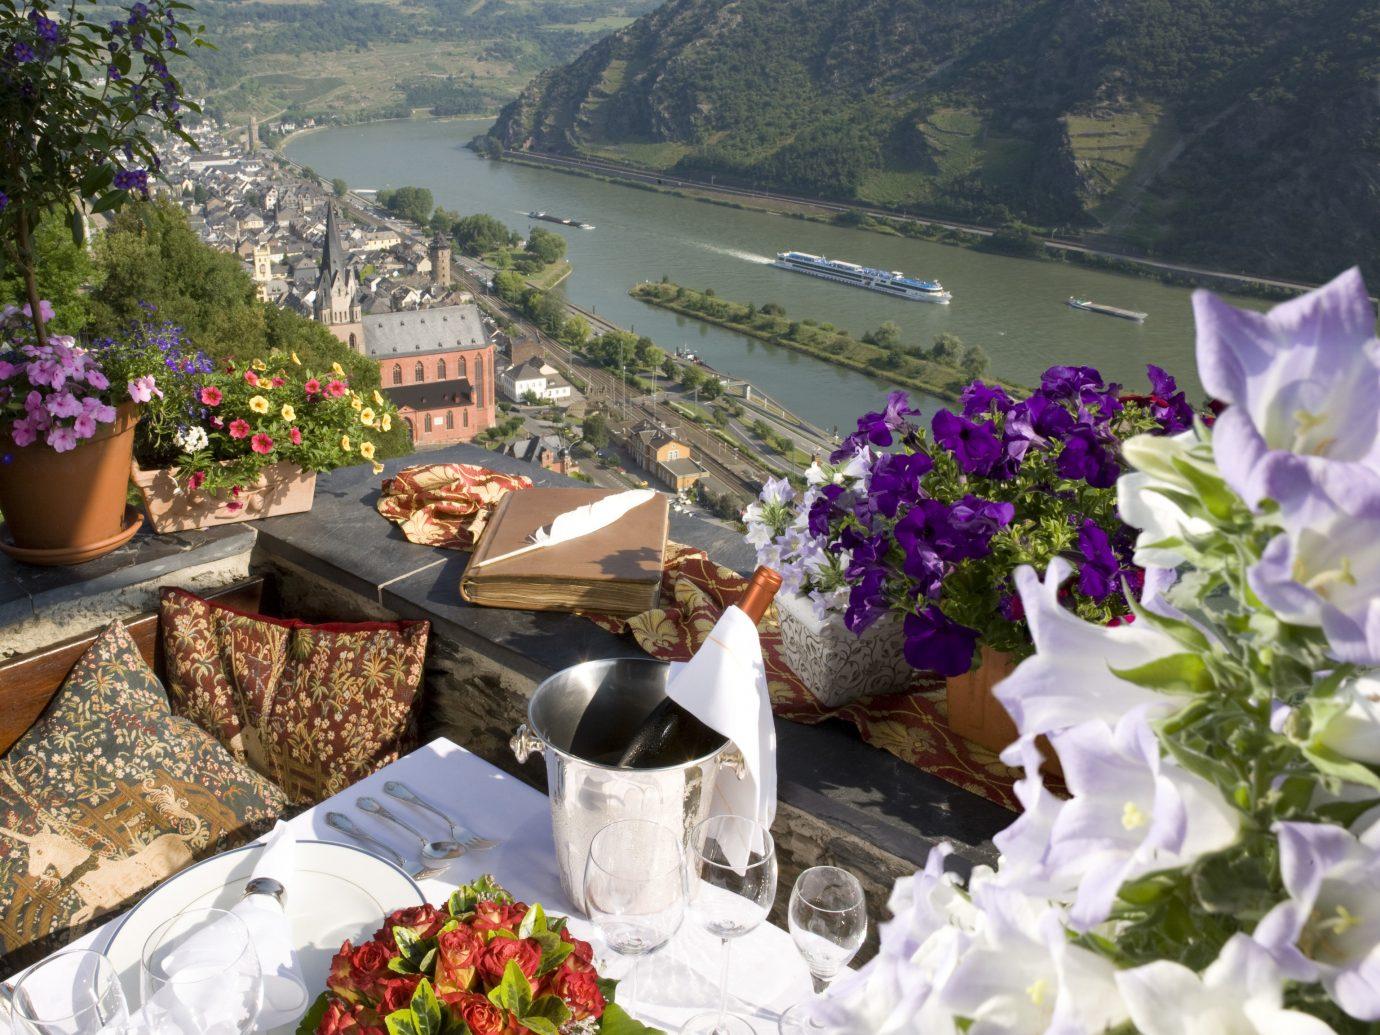 Hotels flower outdoor flora floristry plant